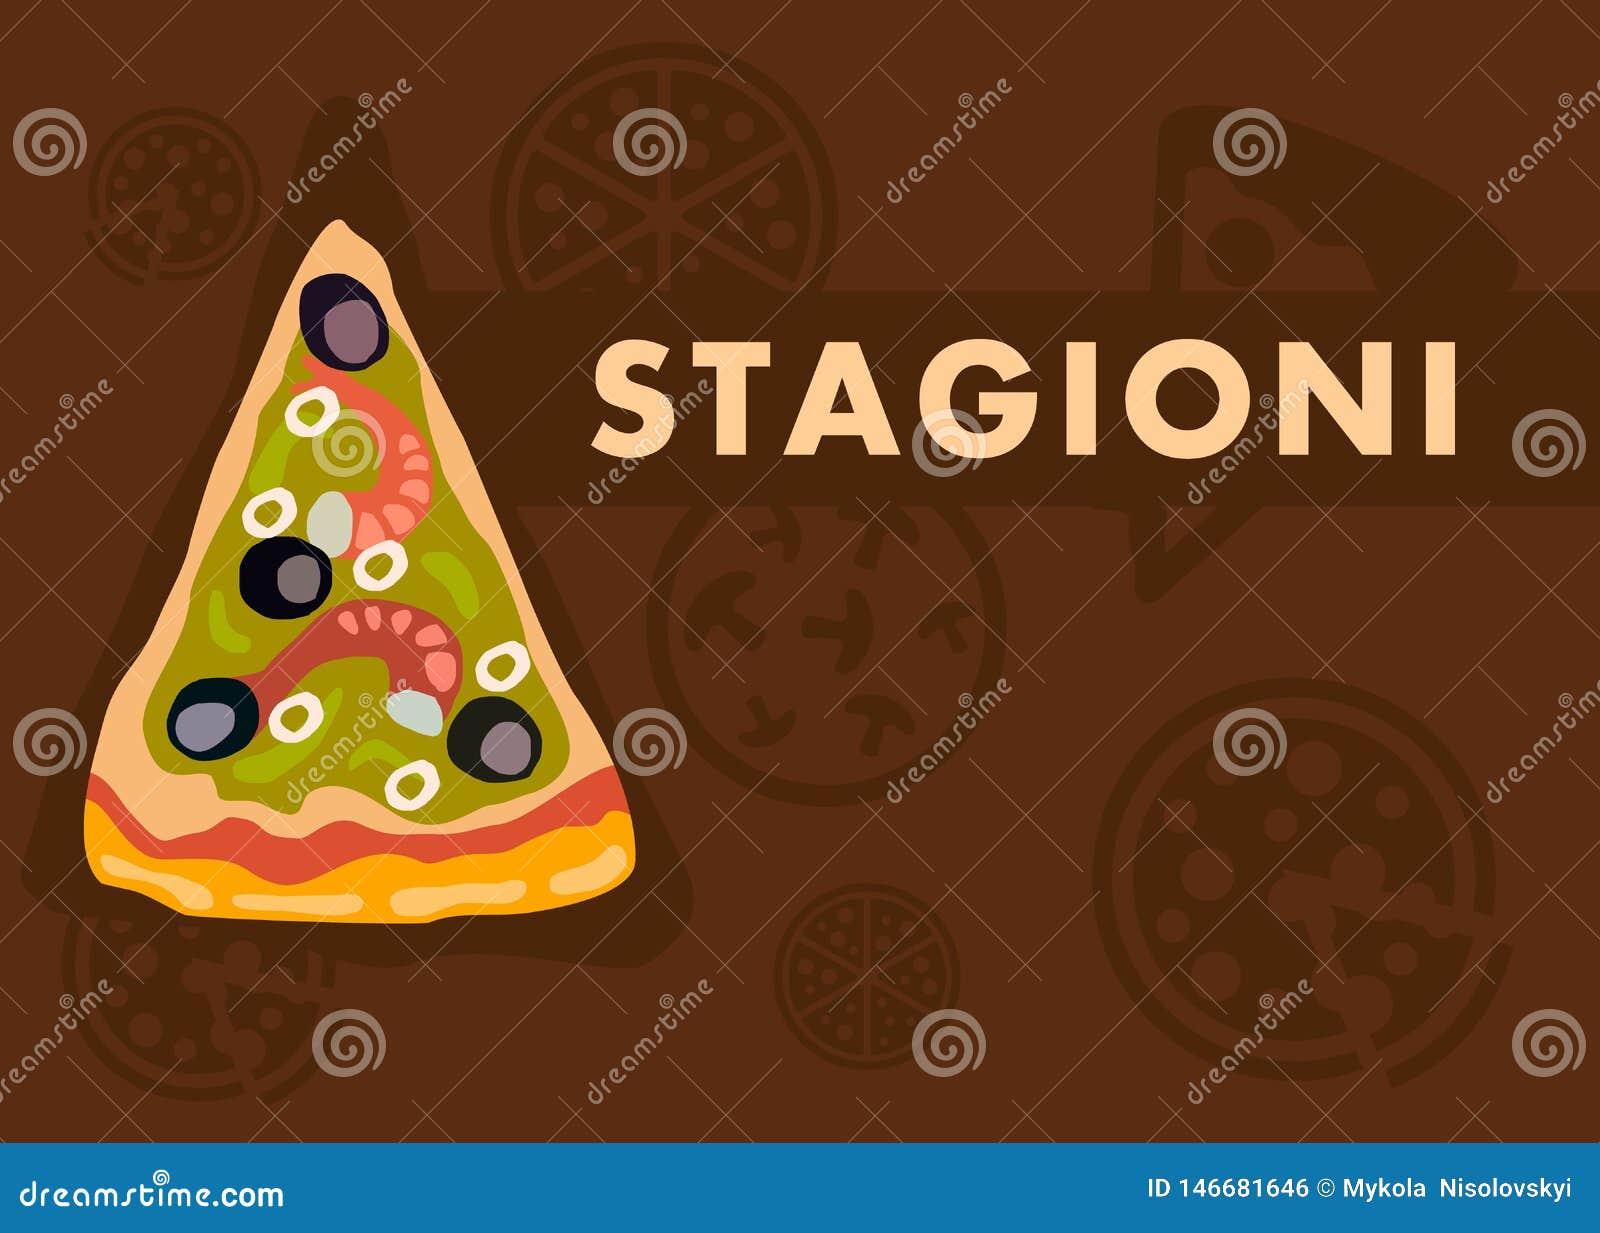 Stagioni Pizza Web Banner Vector Cartoon Template Stock